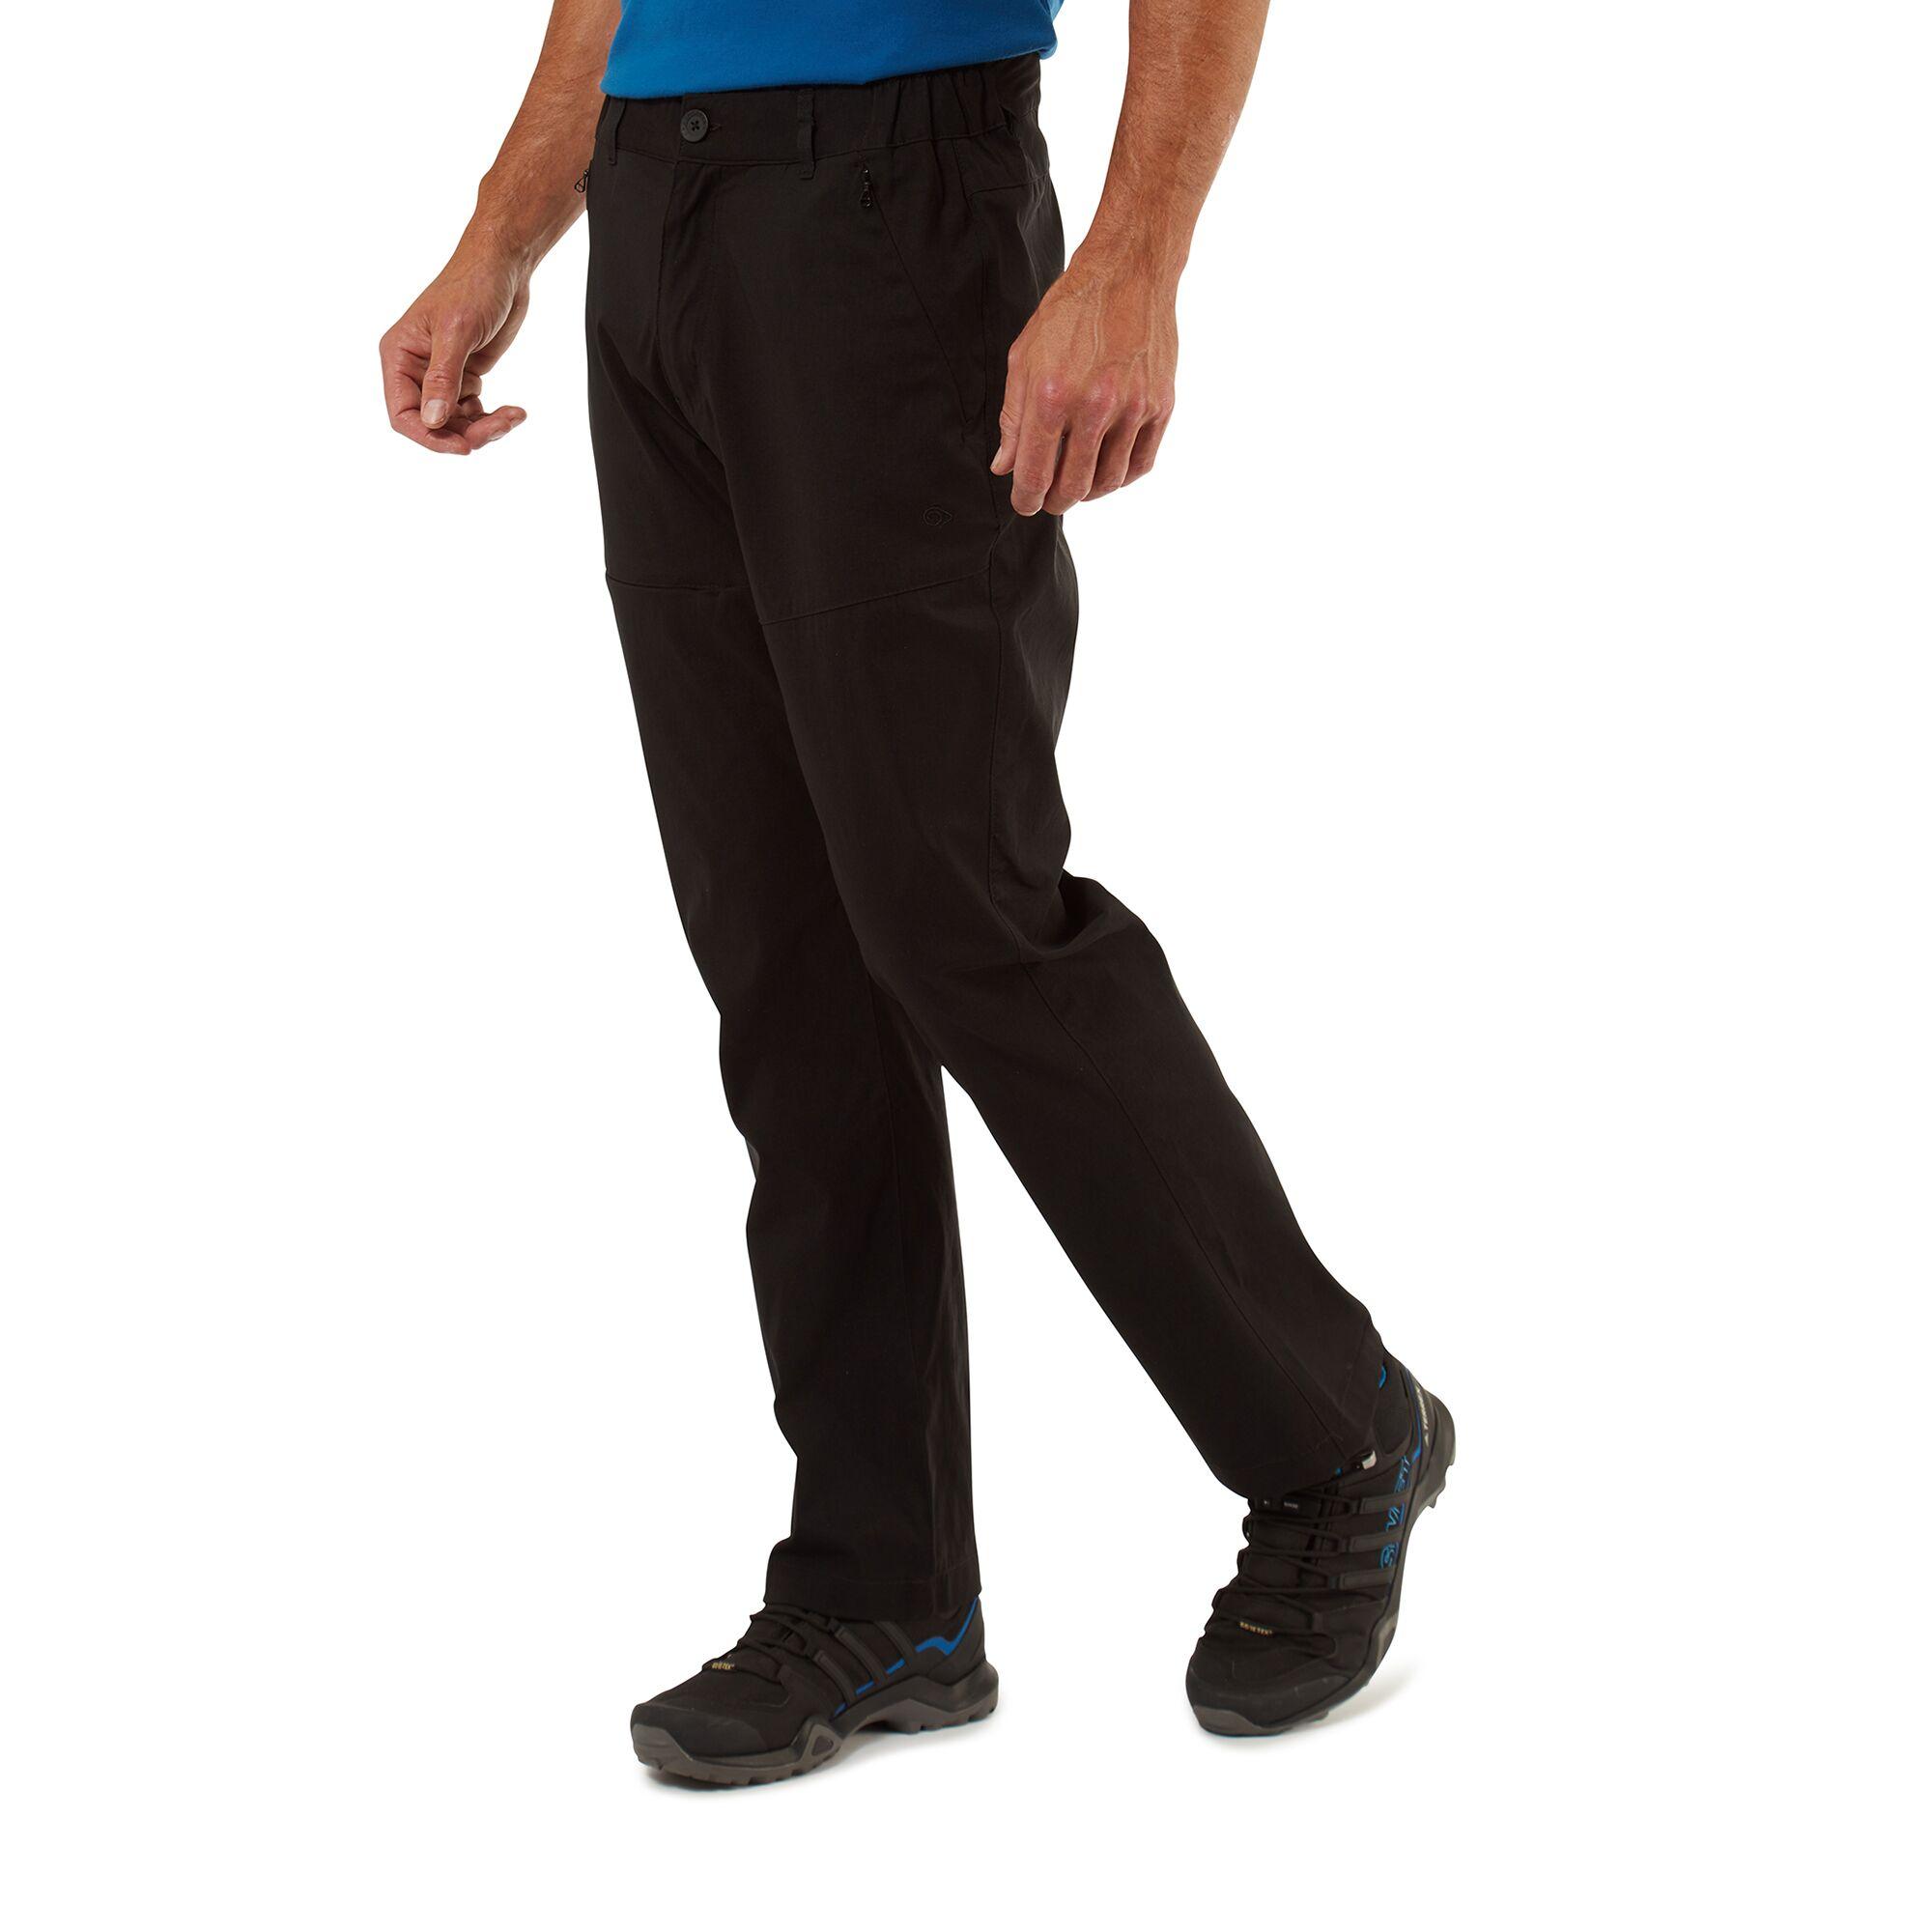 Craghoppers Mens Classic Kiwi Trousers - Bark - 30r